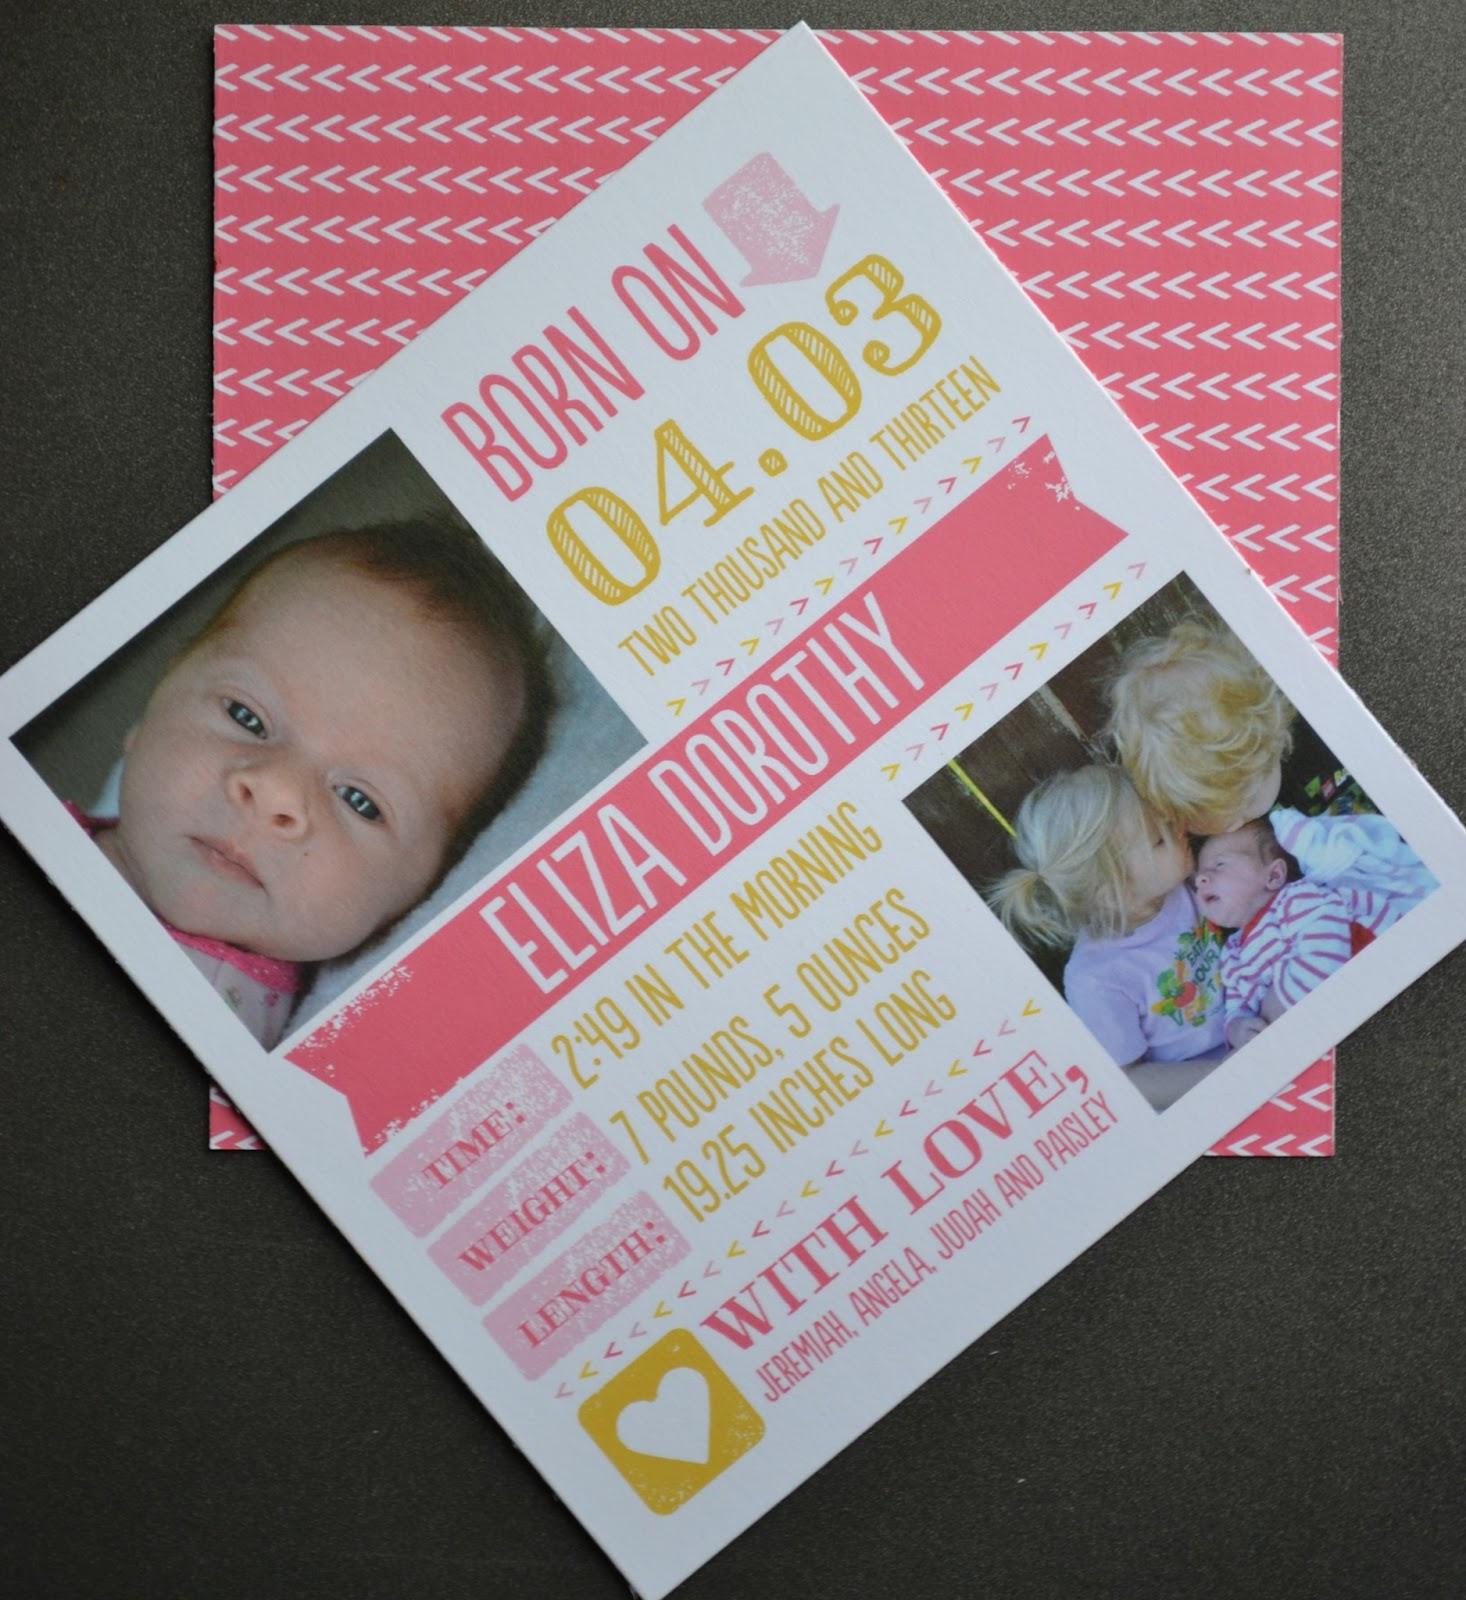 Angela Strand Tiny Prints Birth Announcement – Tiny Prints Birth Announcement